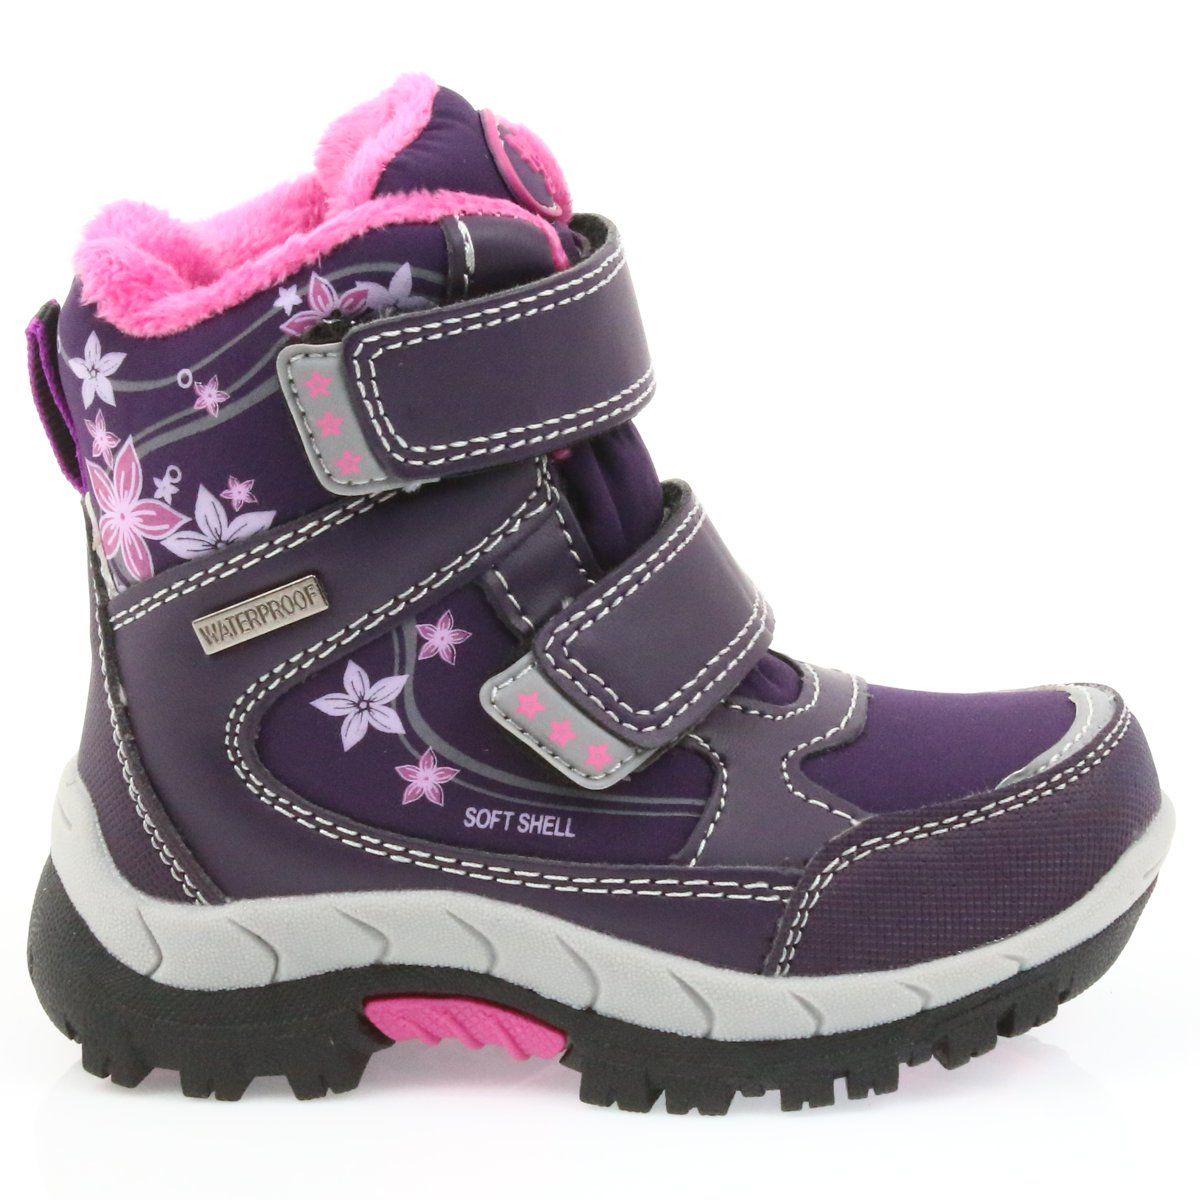 American Club American Kozaki Buty Zimowe Z Membrana 3121 Fioletowe Boots Winter Boot Shoes